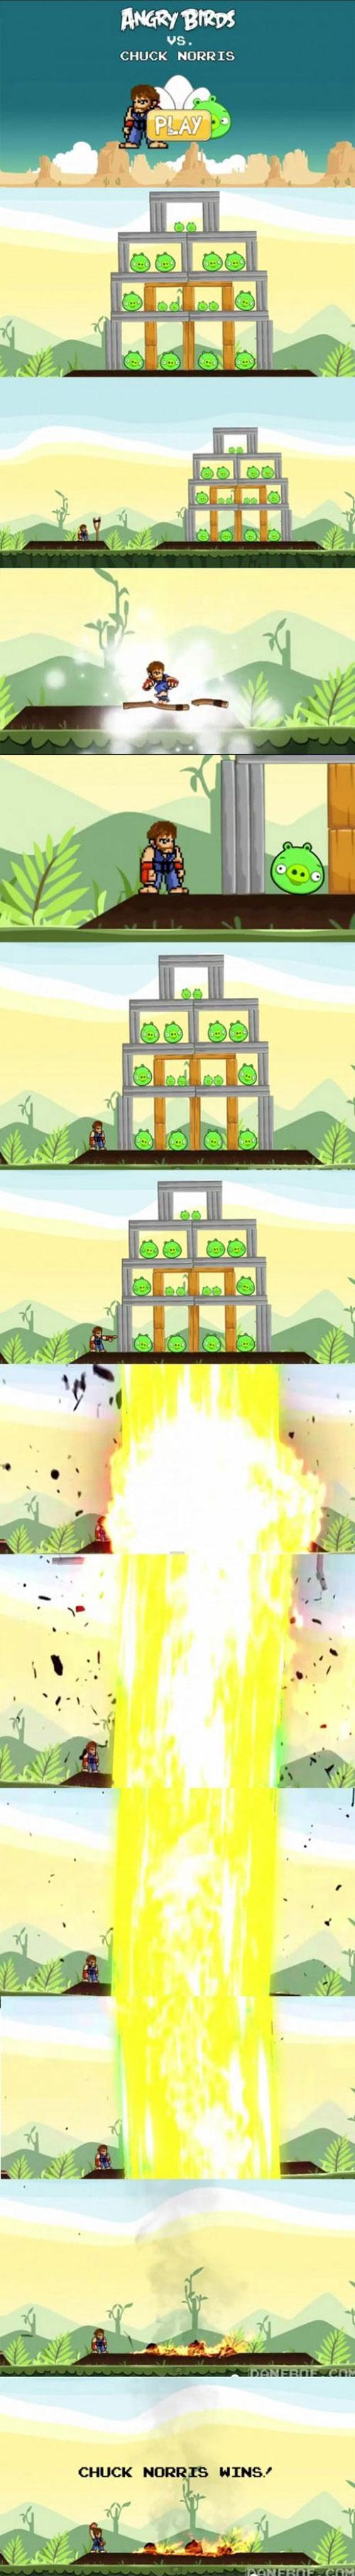 angry birds vs chuck norris